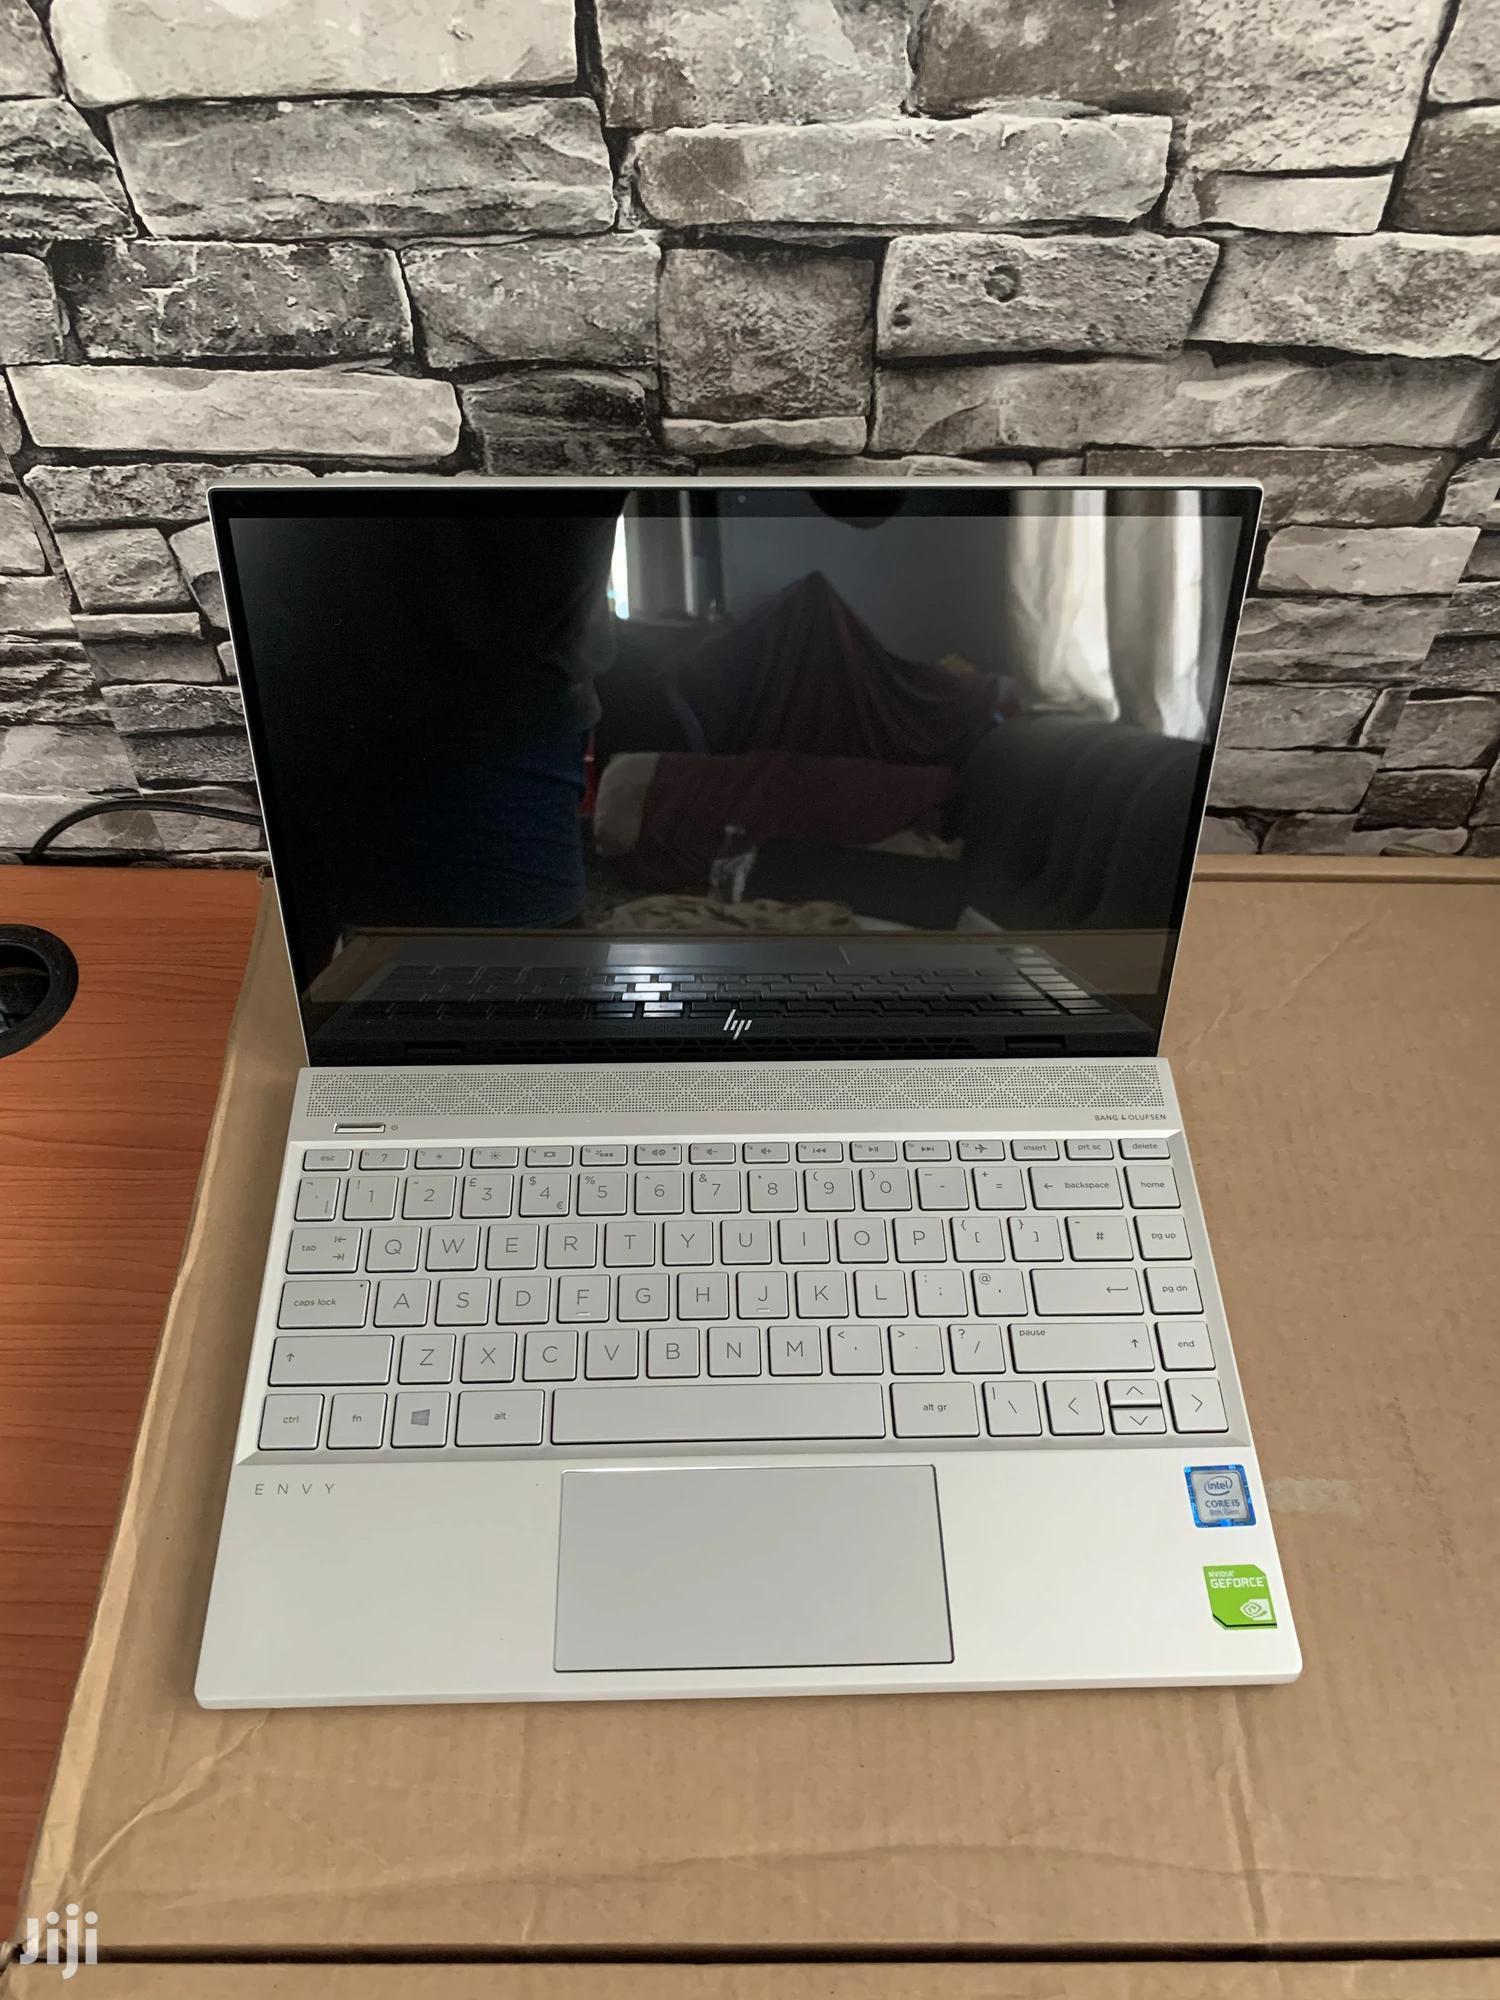 Archive: New Laptop HP Envy 13 8GB Intel Core I5 SSD 256GB